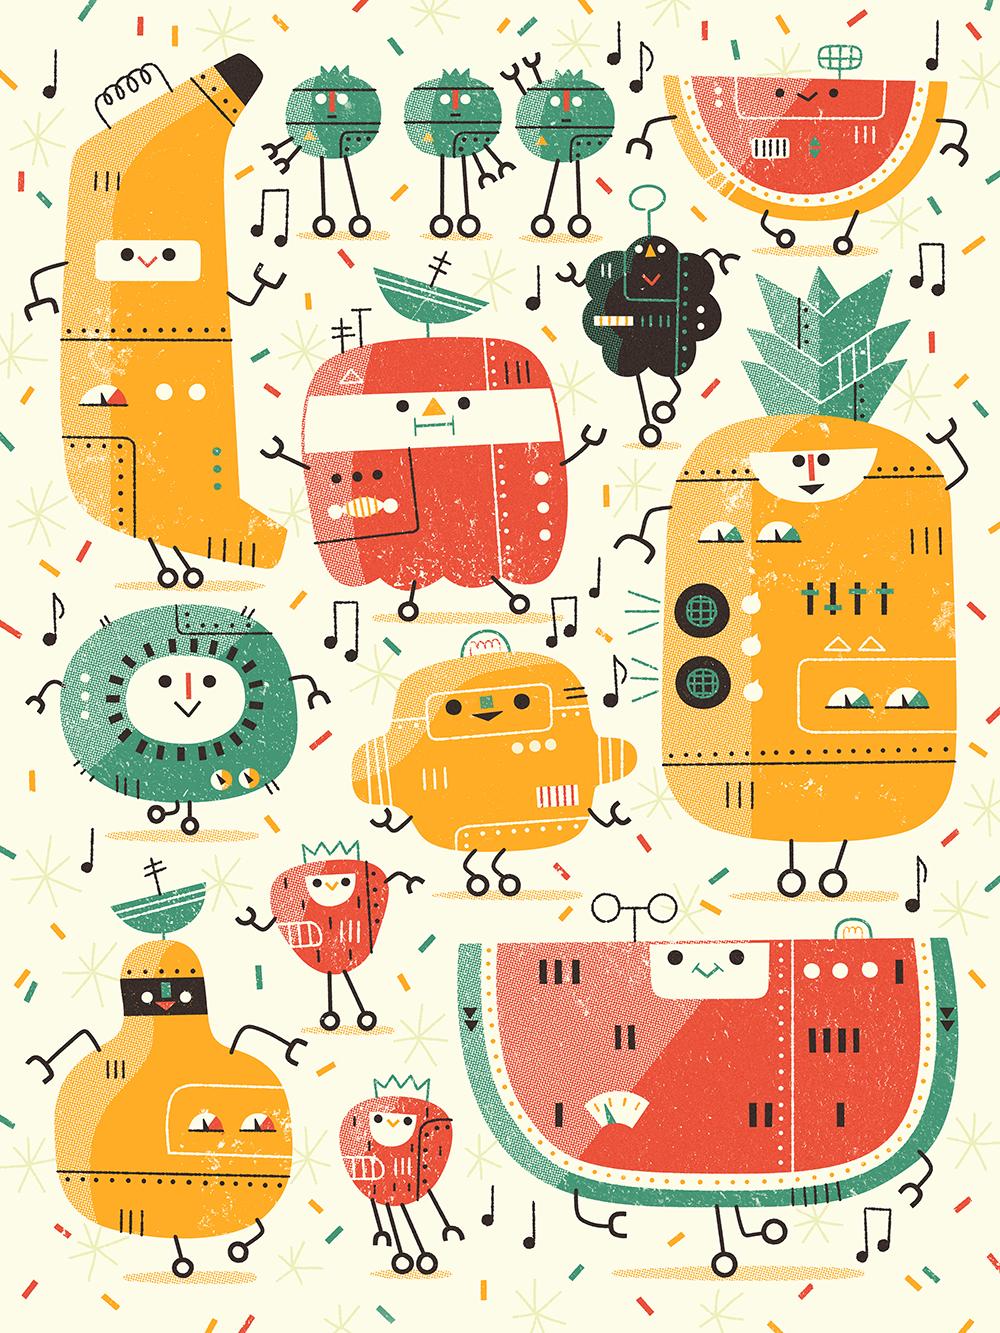 """Fruitbots!"" by Andrew Kolb"